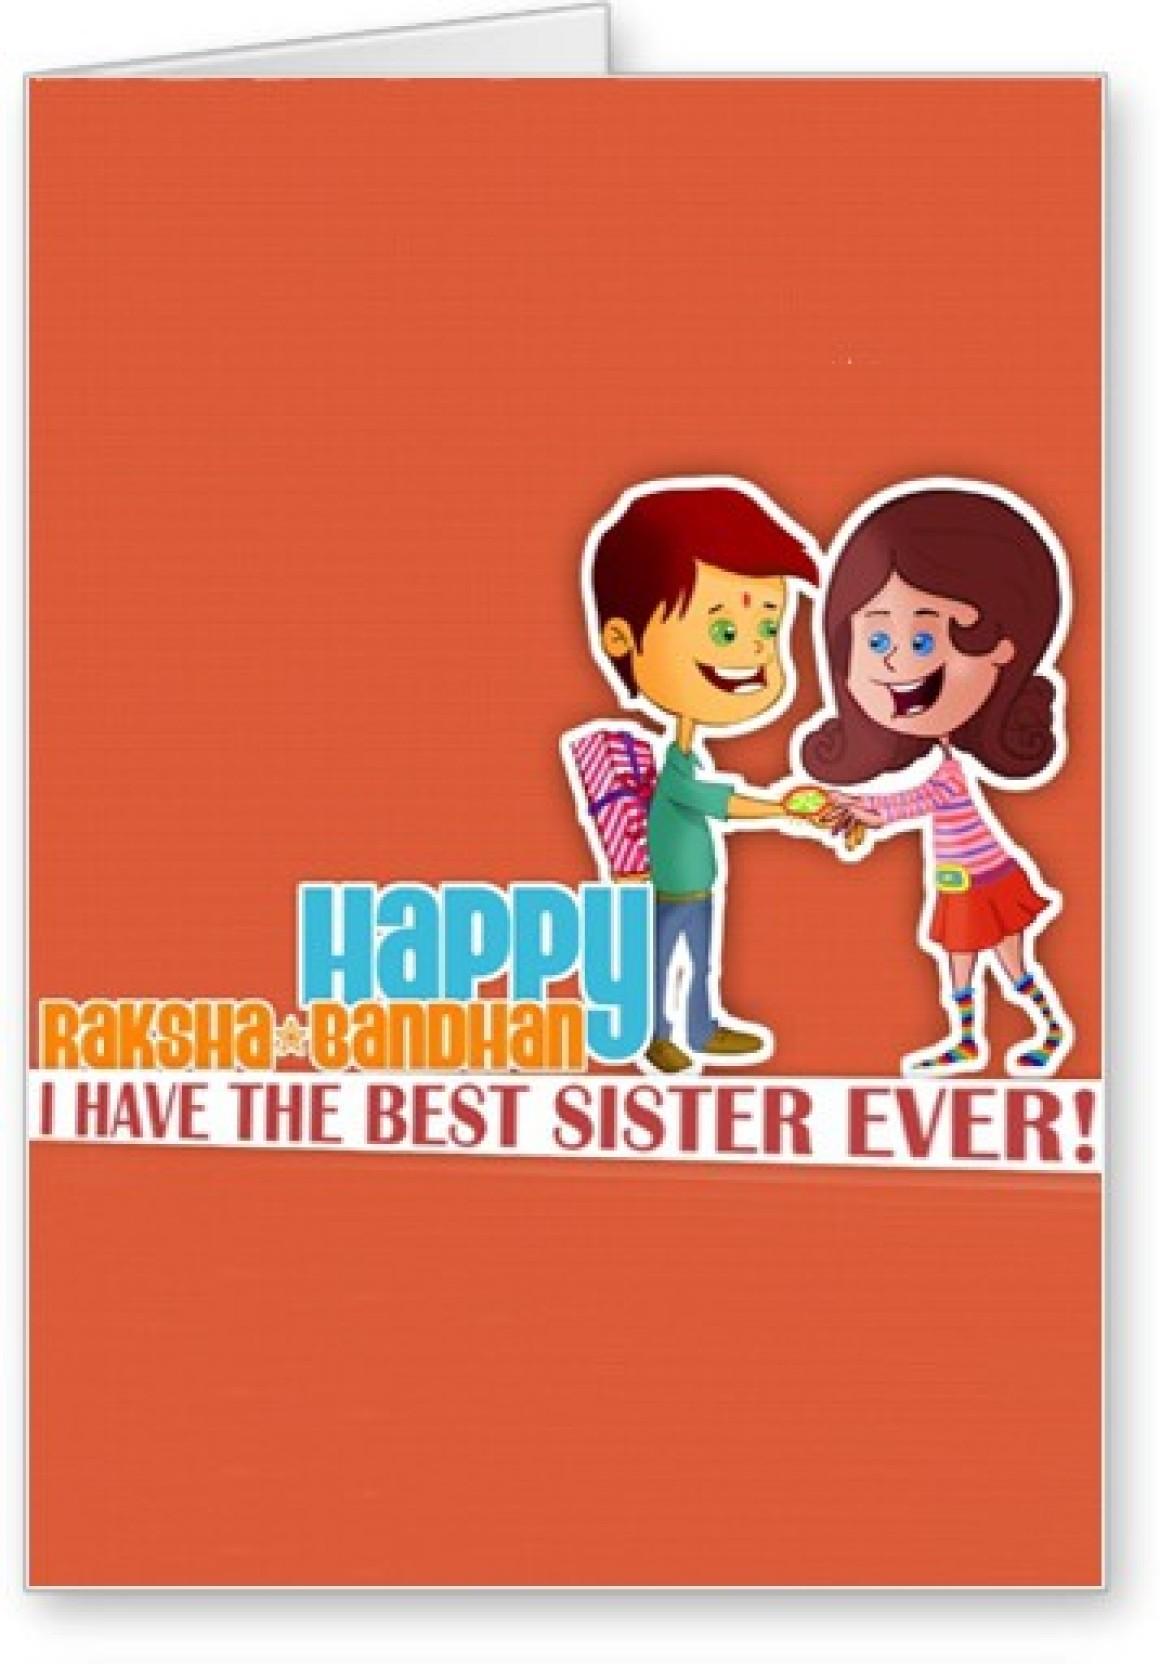 Lolprint Best Sister Ever Raksha Bandhan Greeting Card Price In